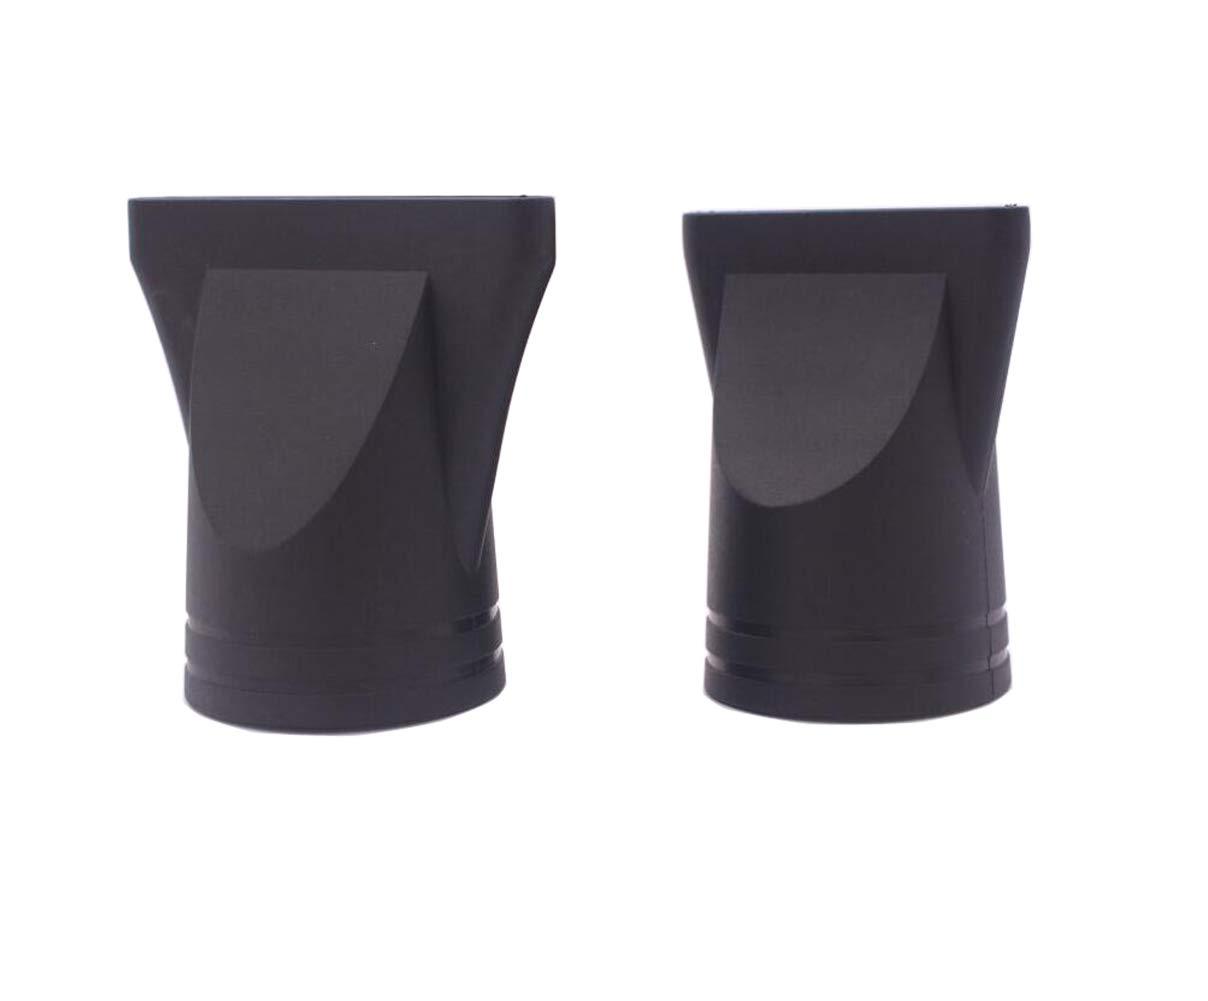 2PCS(Non-Universal) Black Professional Plastic Salon Hair Dryer Nozzle Replacement Narrow Concentrator Replacement Blow Flat Hair Drying Nozzle Special for Outer Diameter 4.5cm and 4.6cm